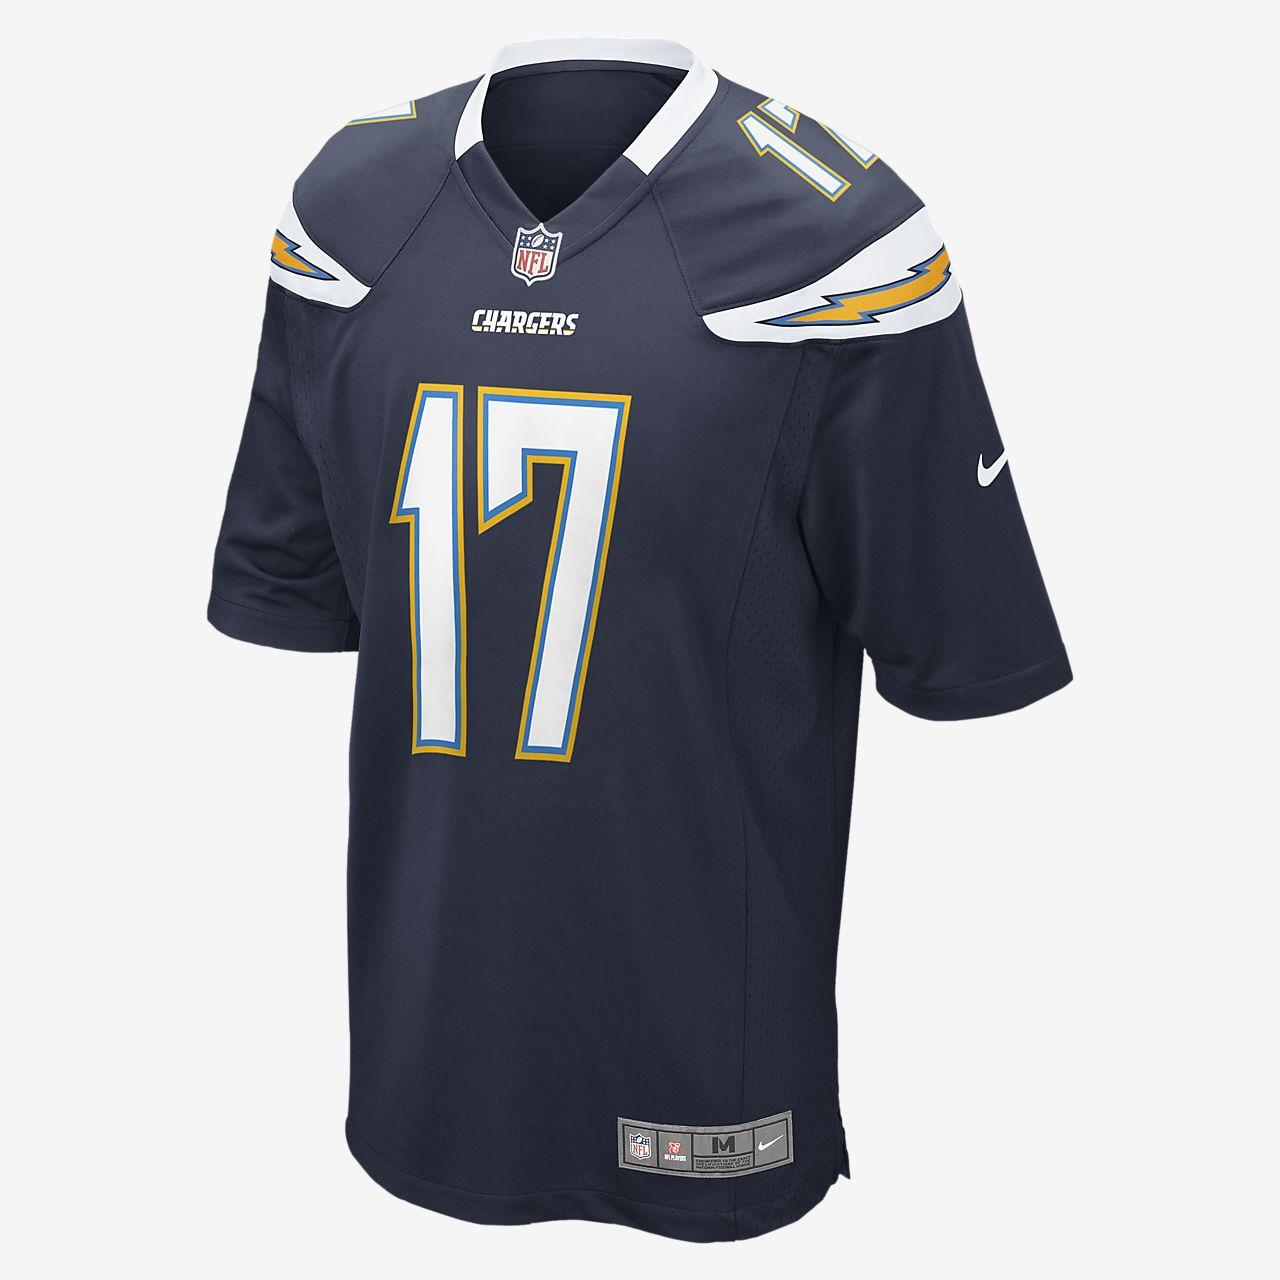 Pánský domácí dres na americký fotbal NFL Los Angeles Chargers (Philip Rivers)